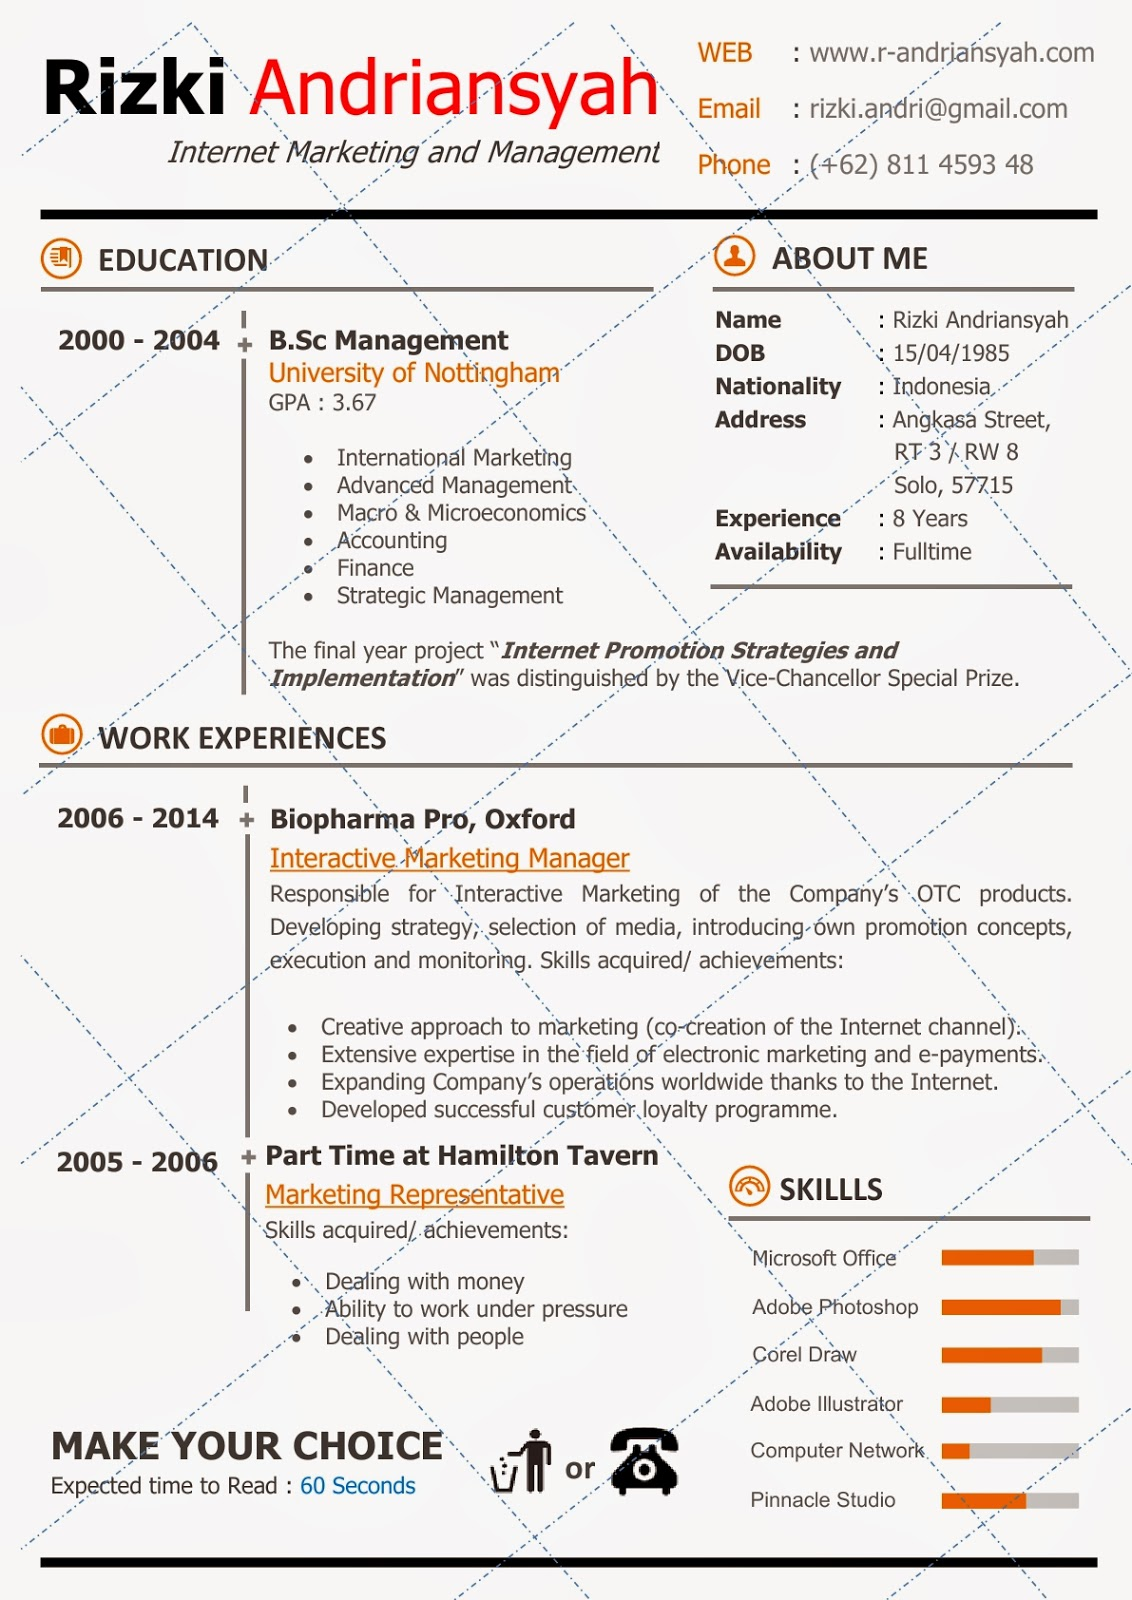 cv templates on word sample customer service resume cv templates on word 2010 cvfolio best 10 resume templates for microsoft word desain cv kreatif